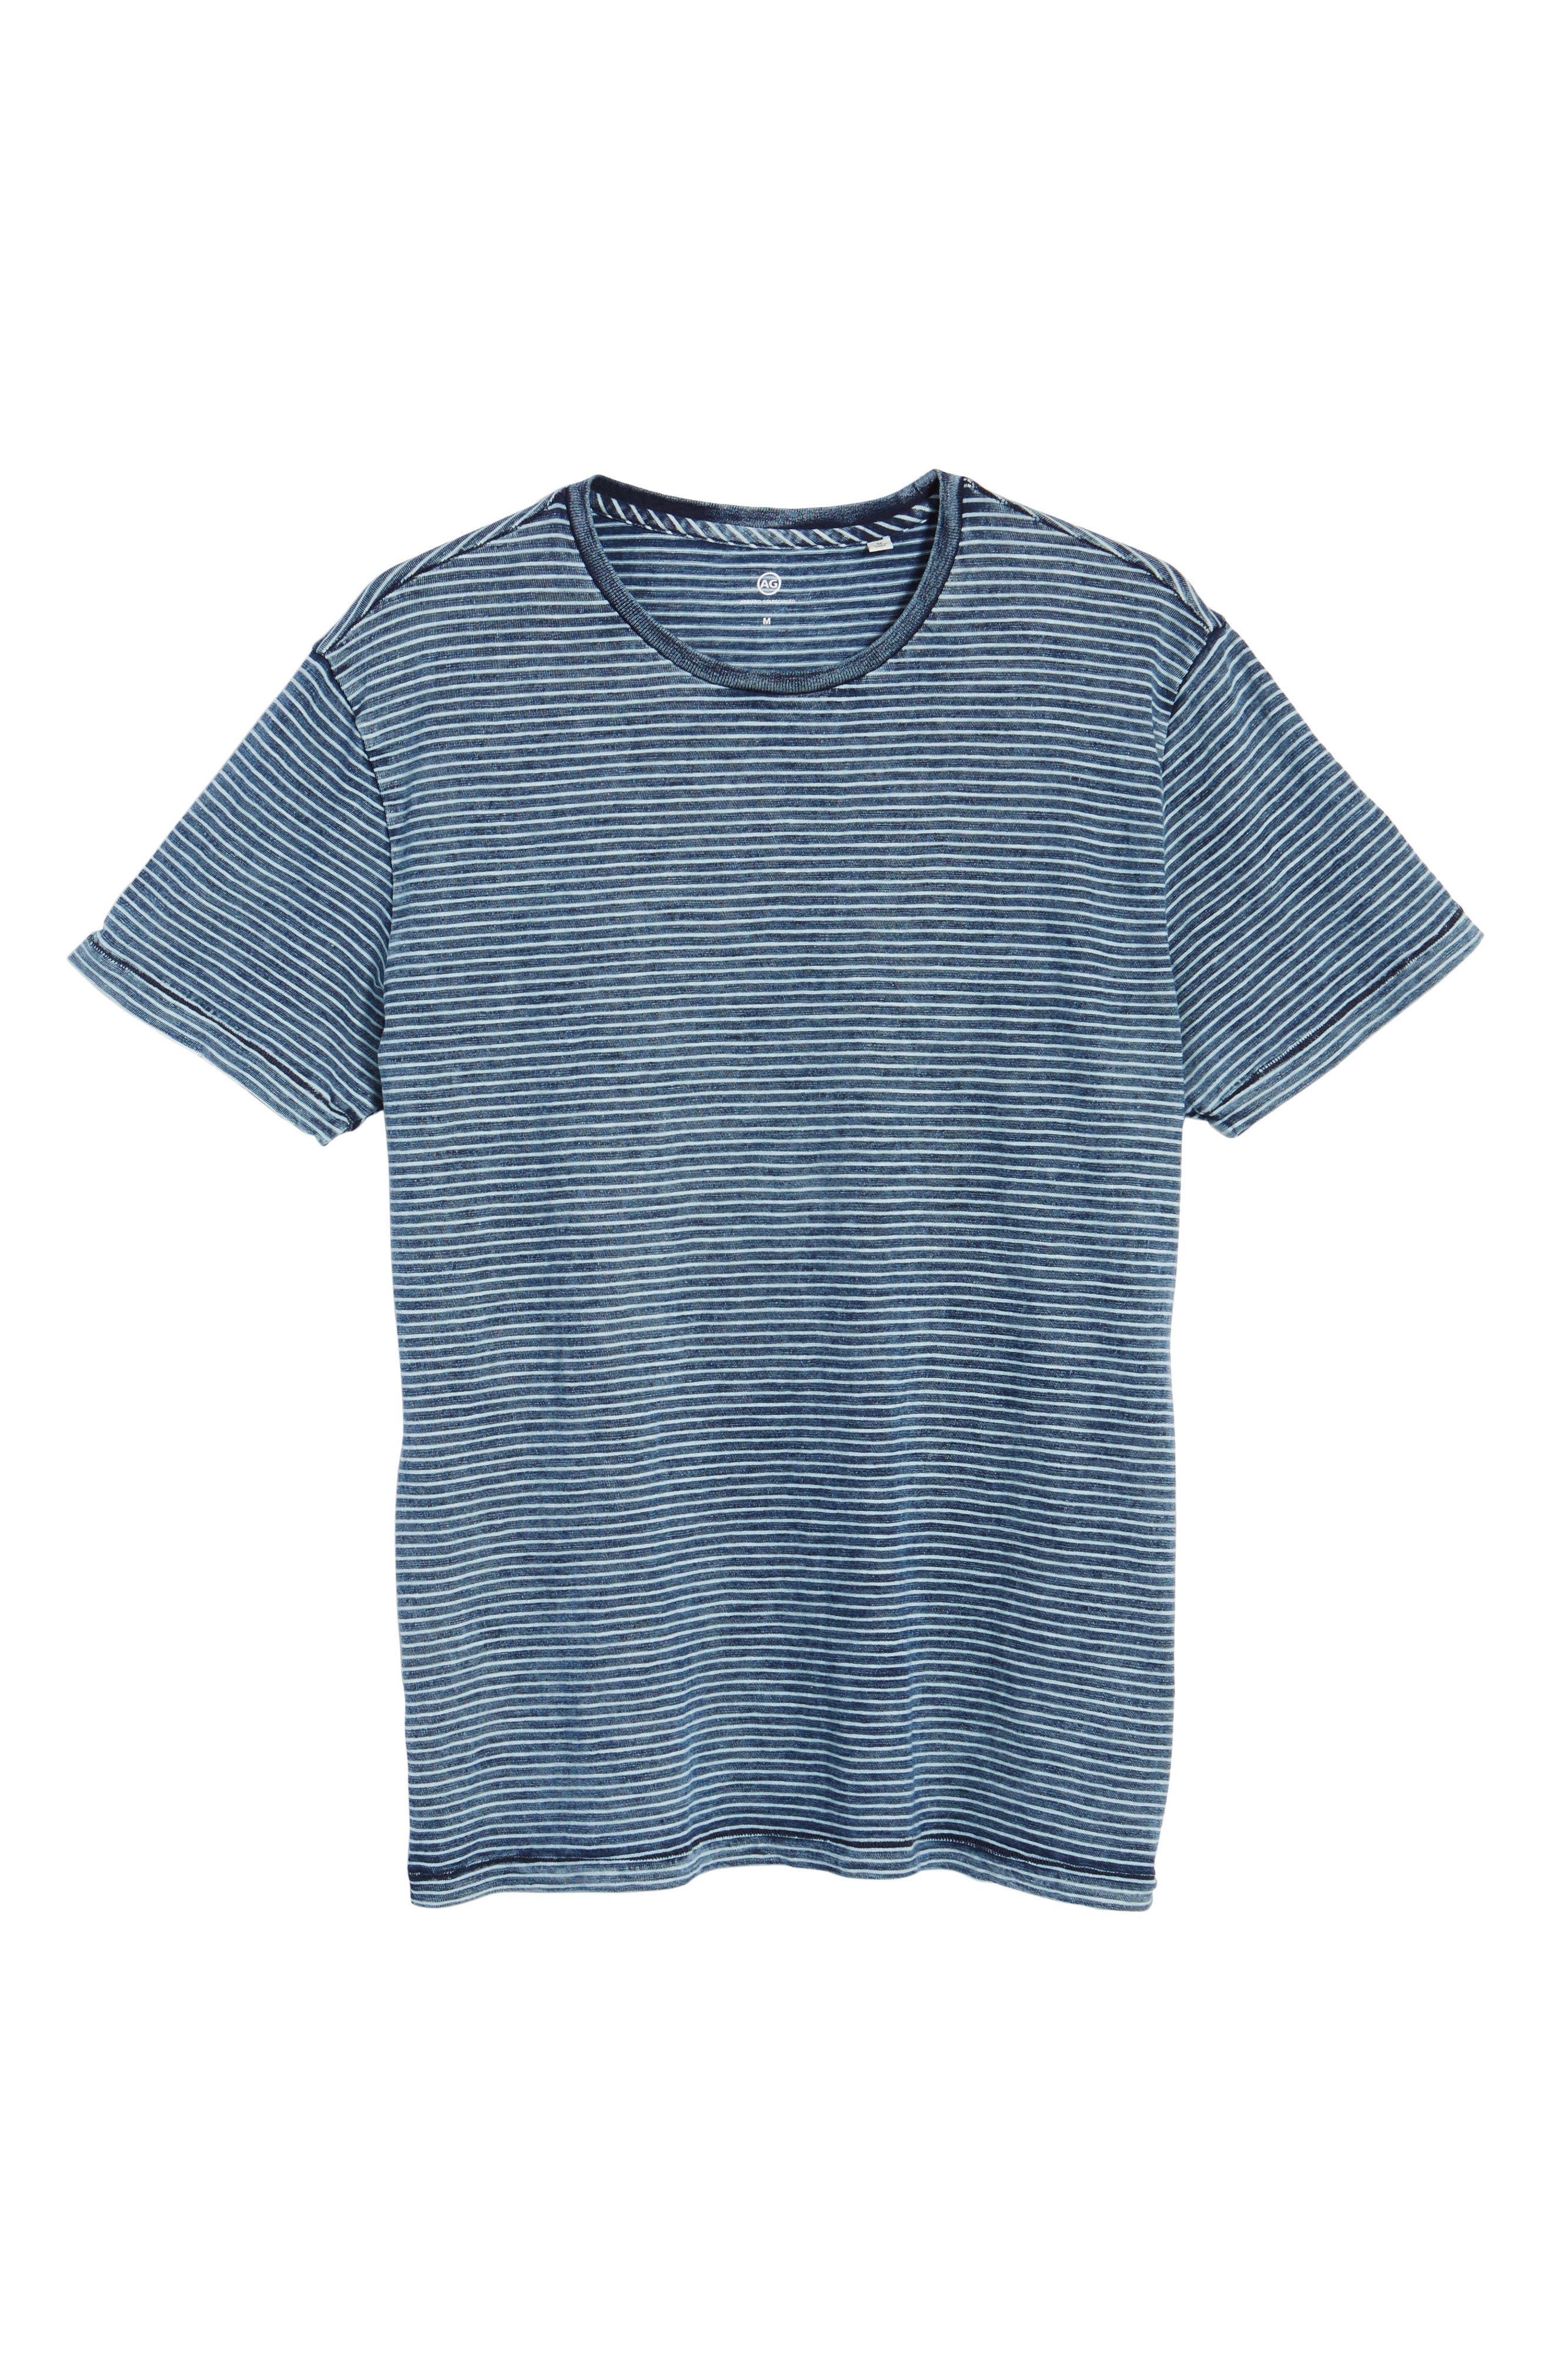 Julian Slim Fit Crewneck Shirt,                             Alternate thumbnail 18, color,